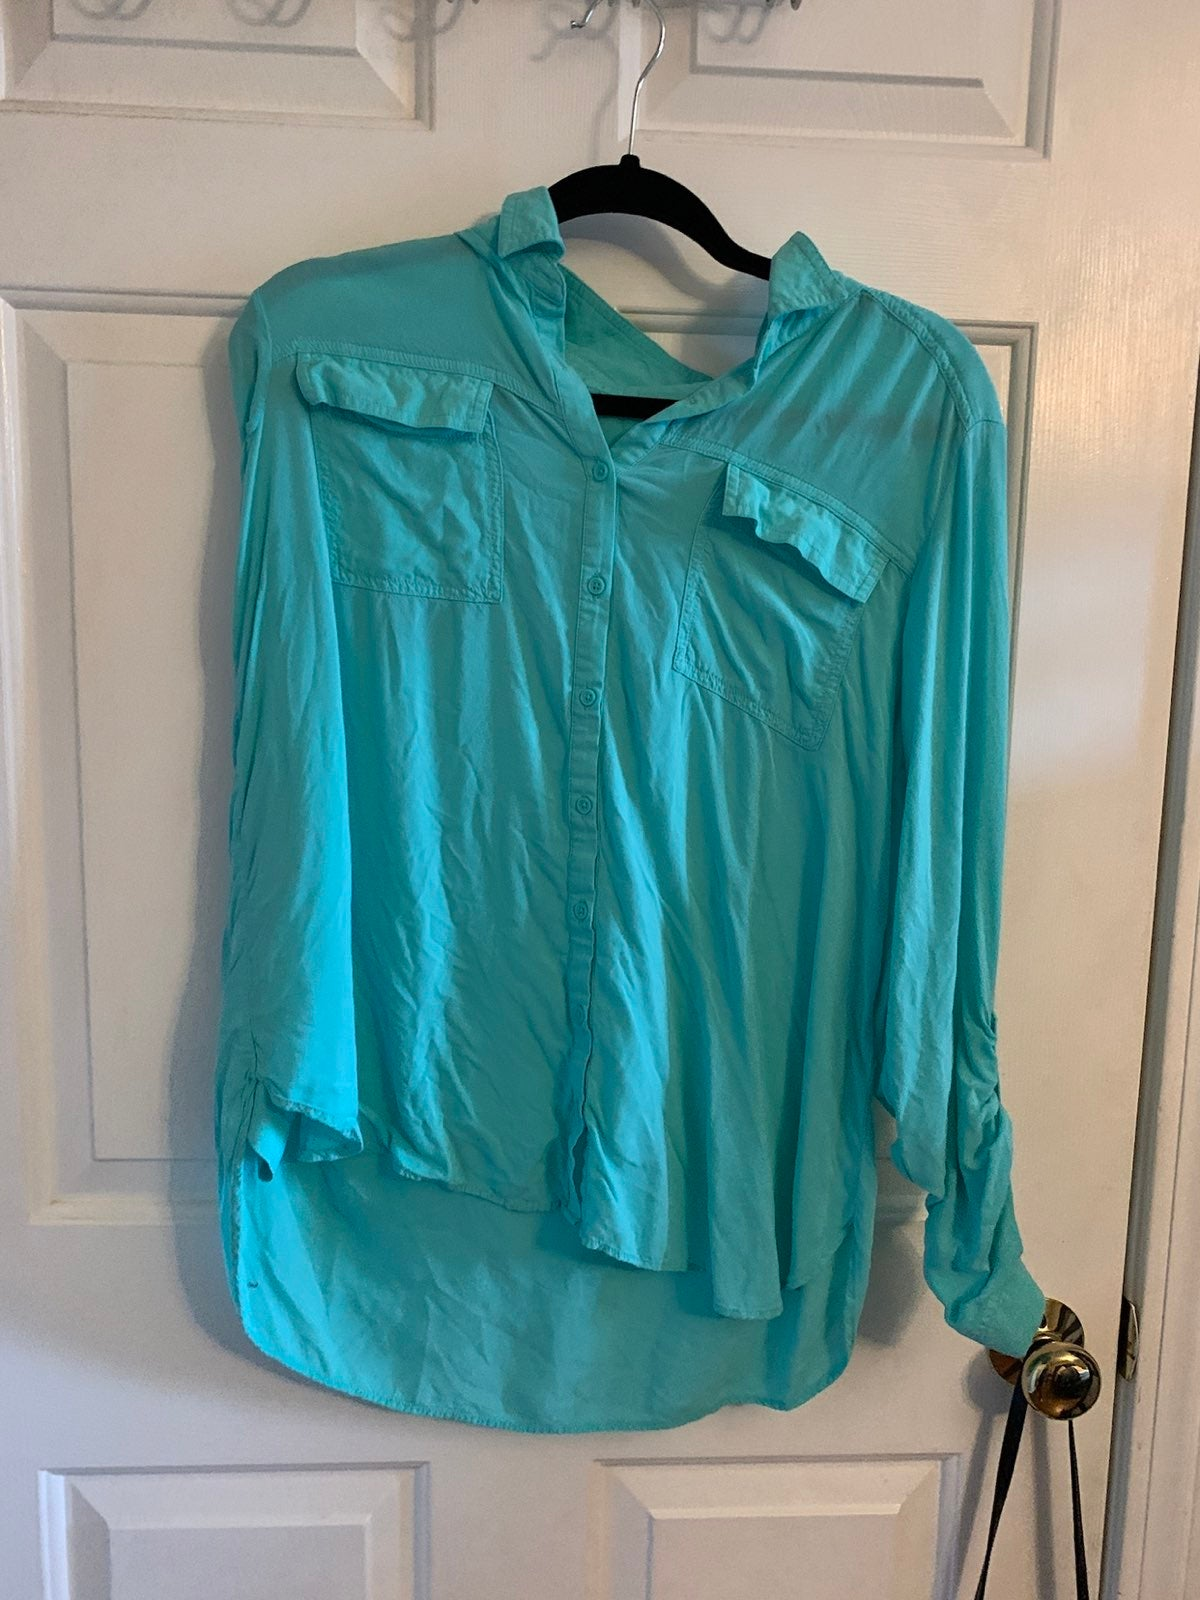 blouses for women xl mint green